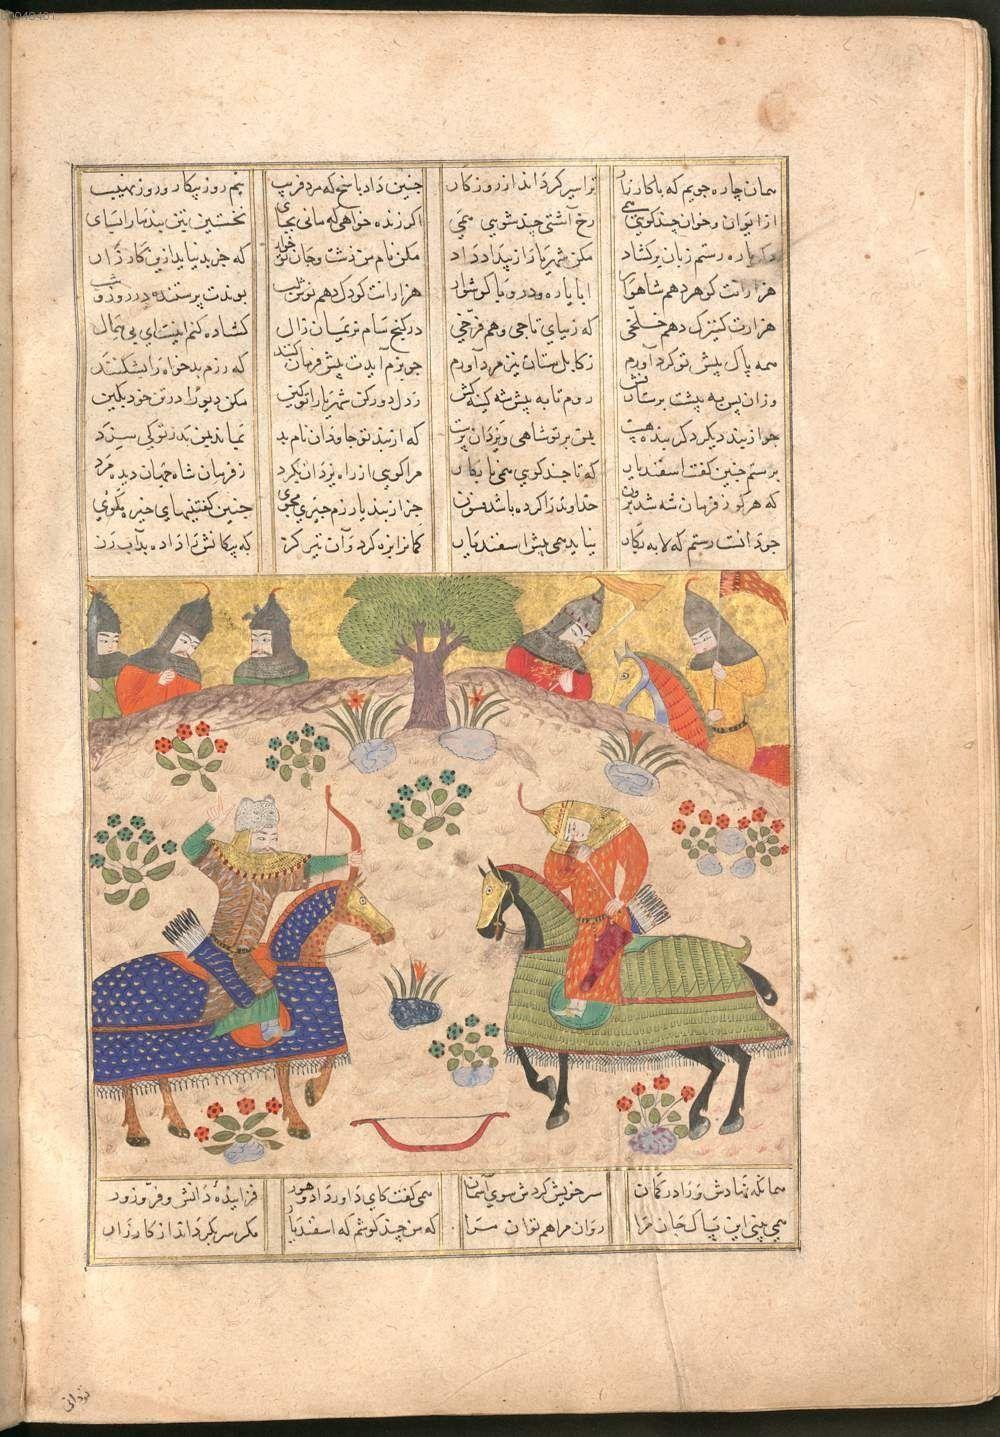 Firdausī: Šāhnāma - BSB Cod.pers. 8. - Iran, 1497 [902 h.] 20 Bayerische Staatsbibliothek